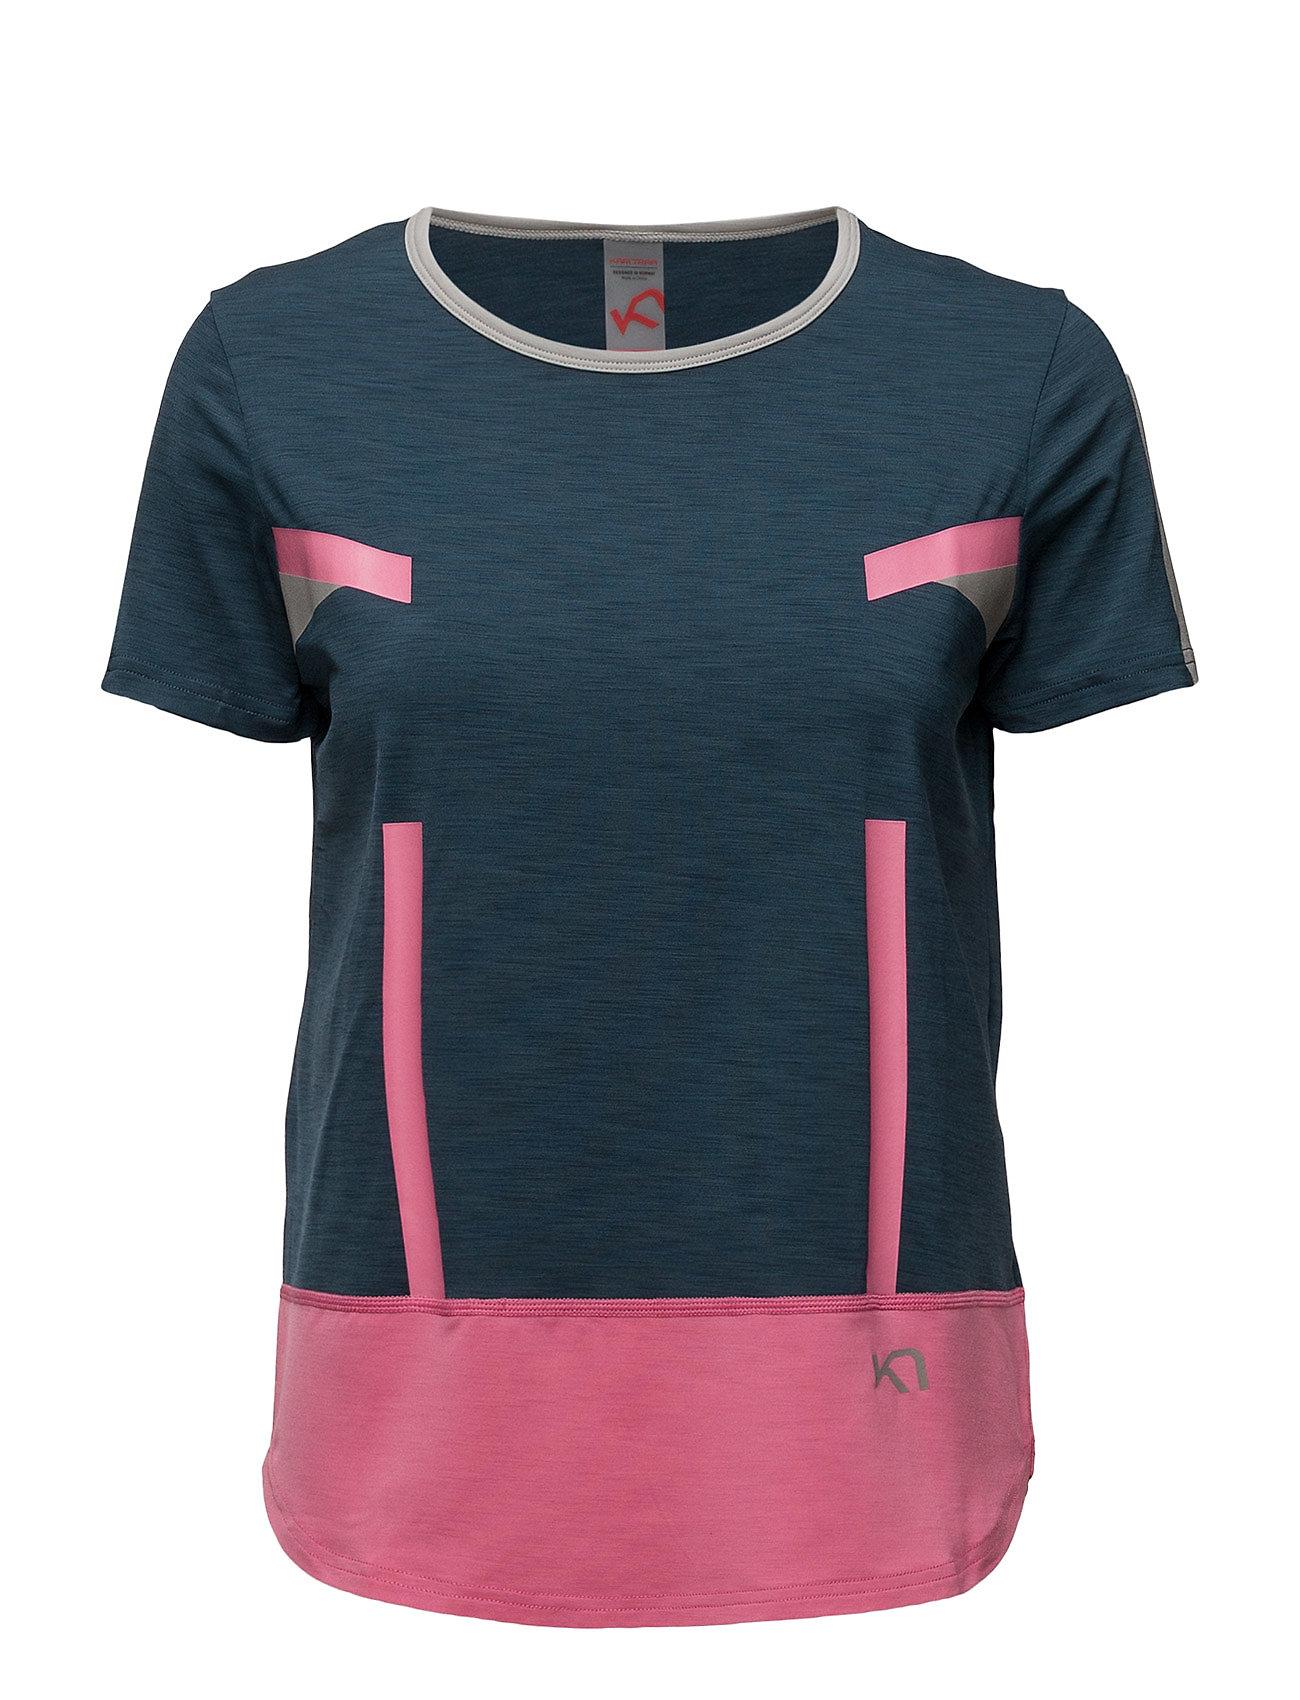 Anita Tee Kari Traa Løbe t-shirts til Damer i